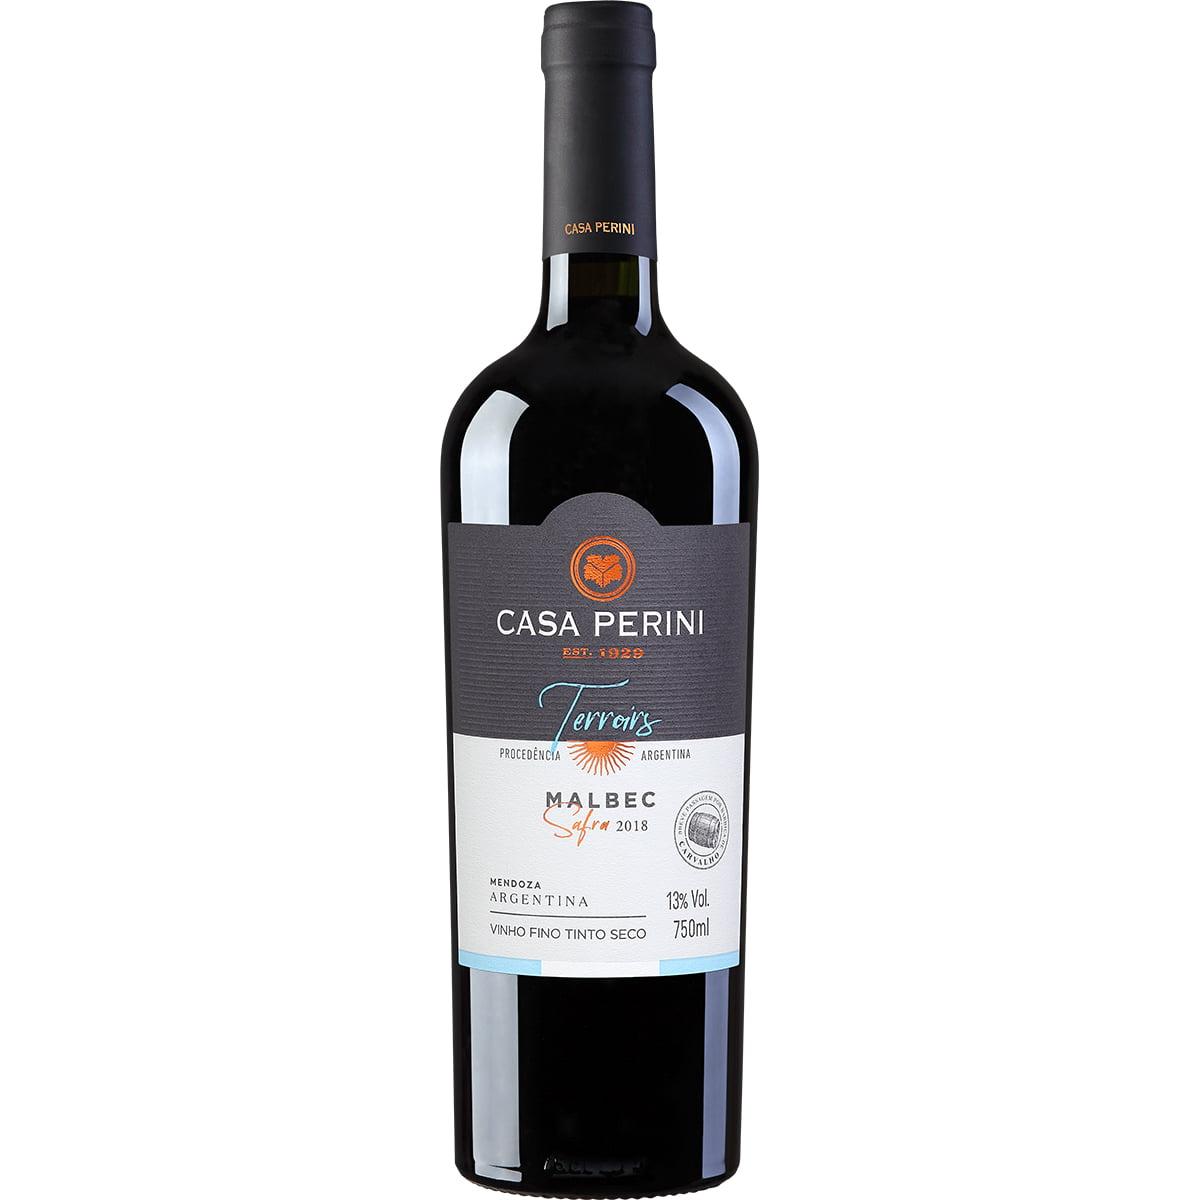 Vinho Casa Perini Terroirs Malbec Tinto 750ml